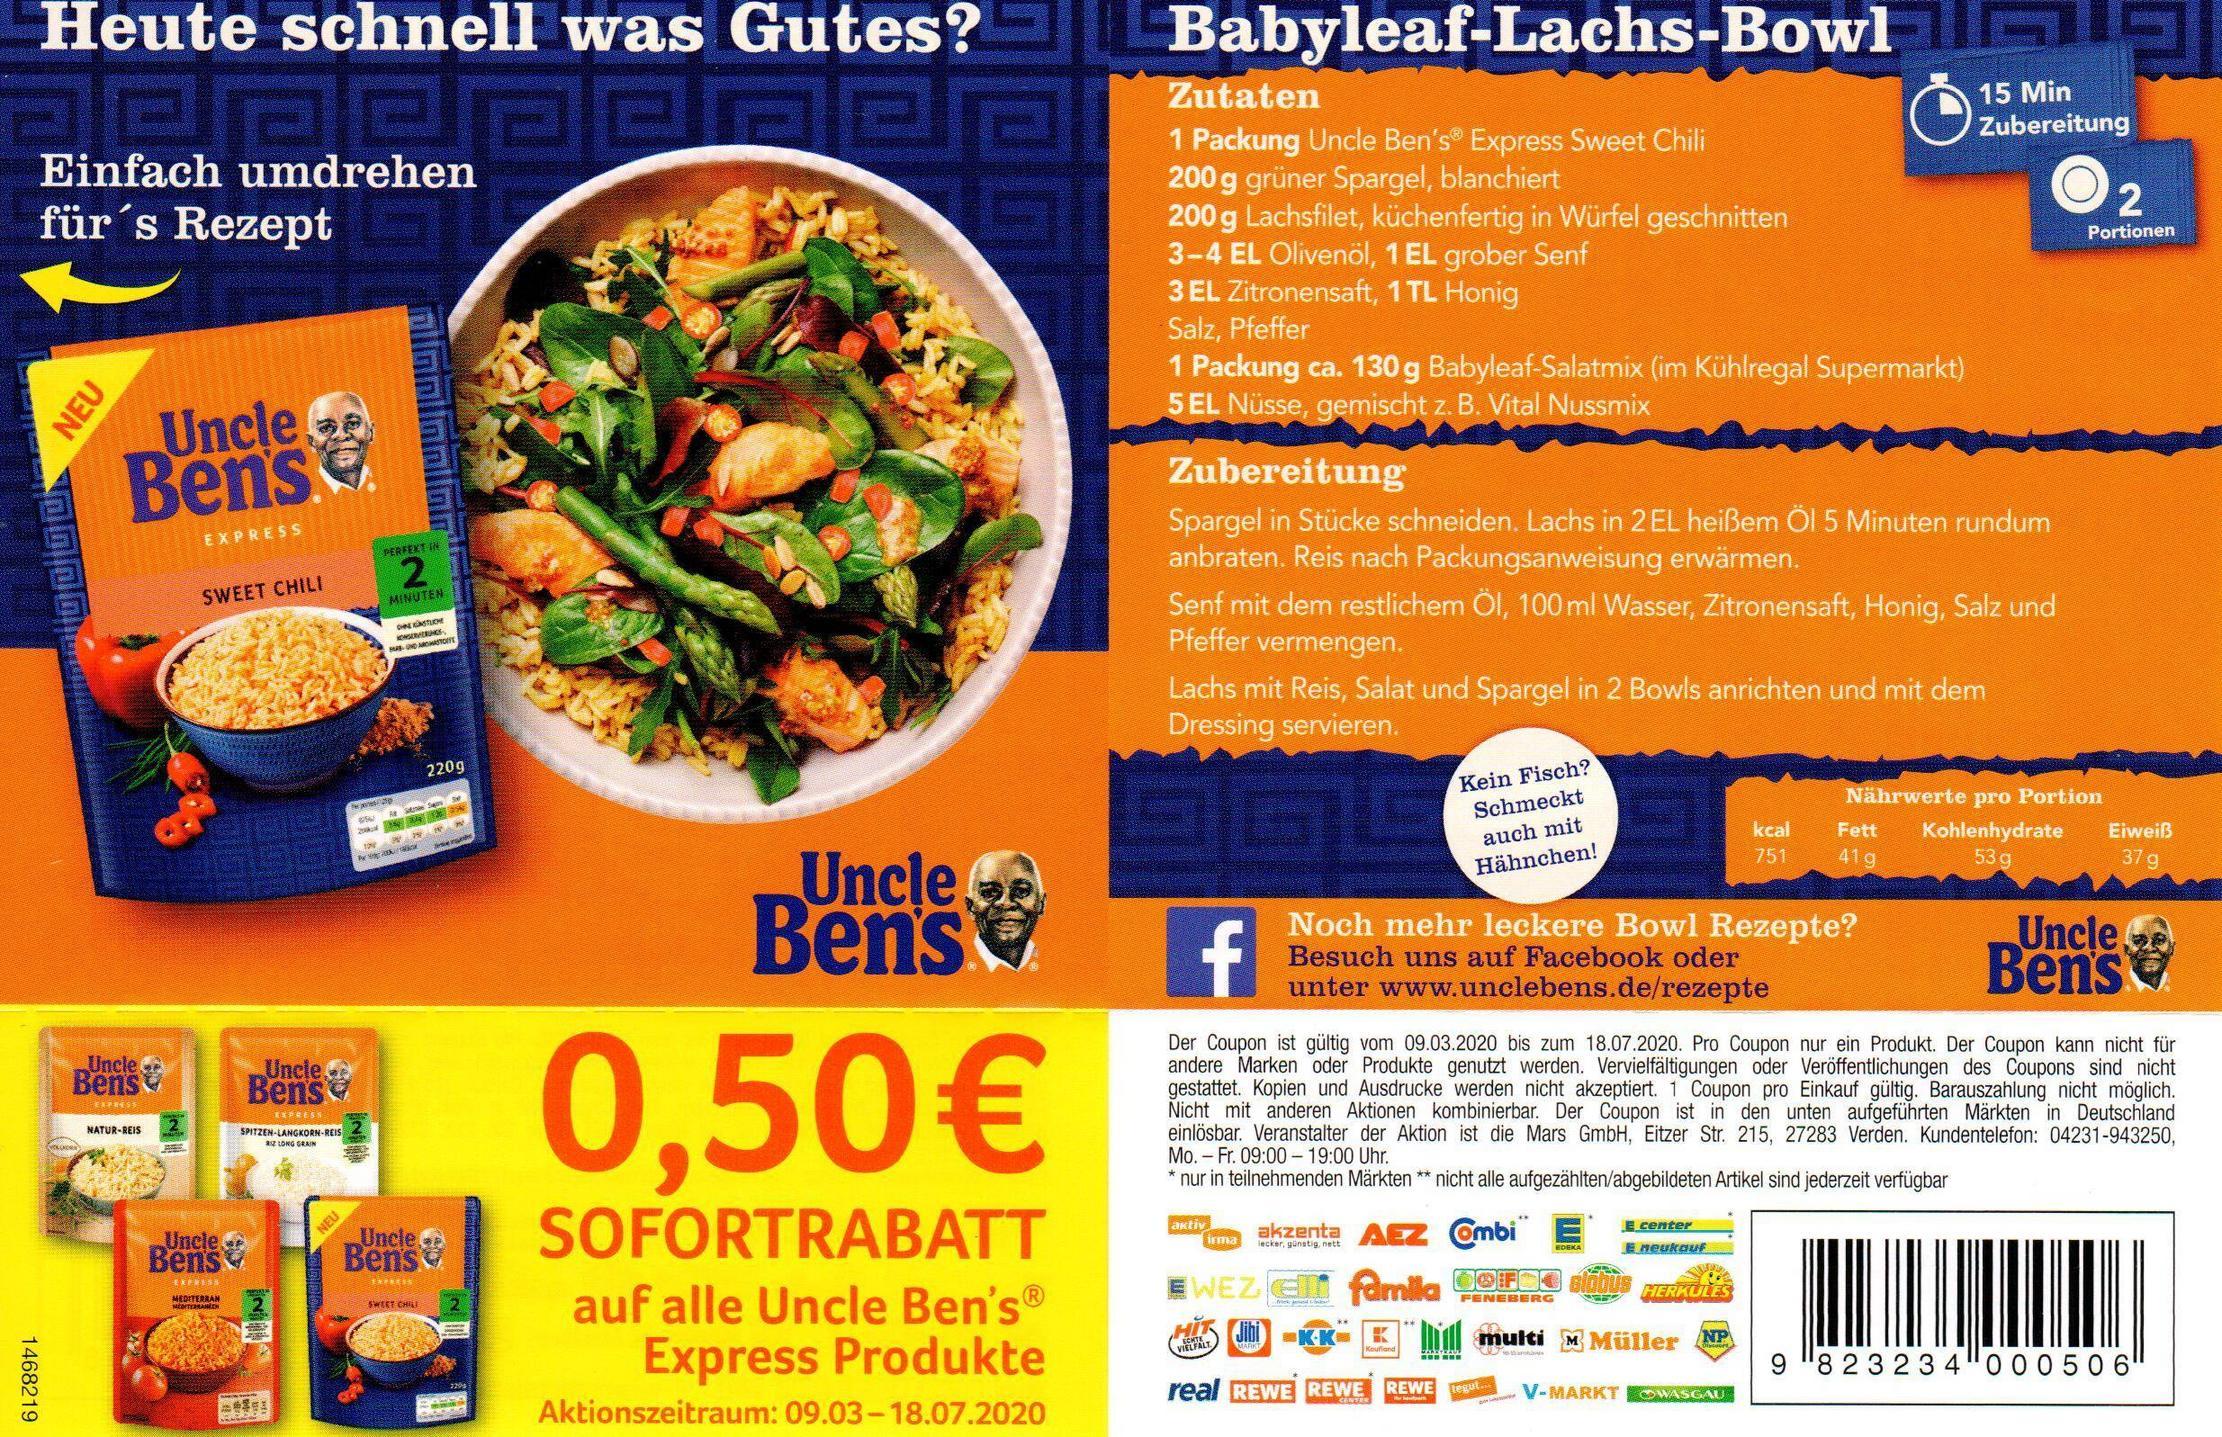 0,50€ Sofort-Rabatt Coupon für Uncle Ben's xpress Produkte